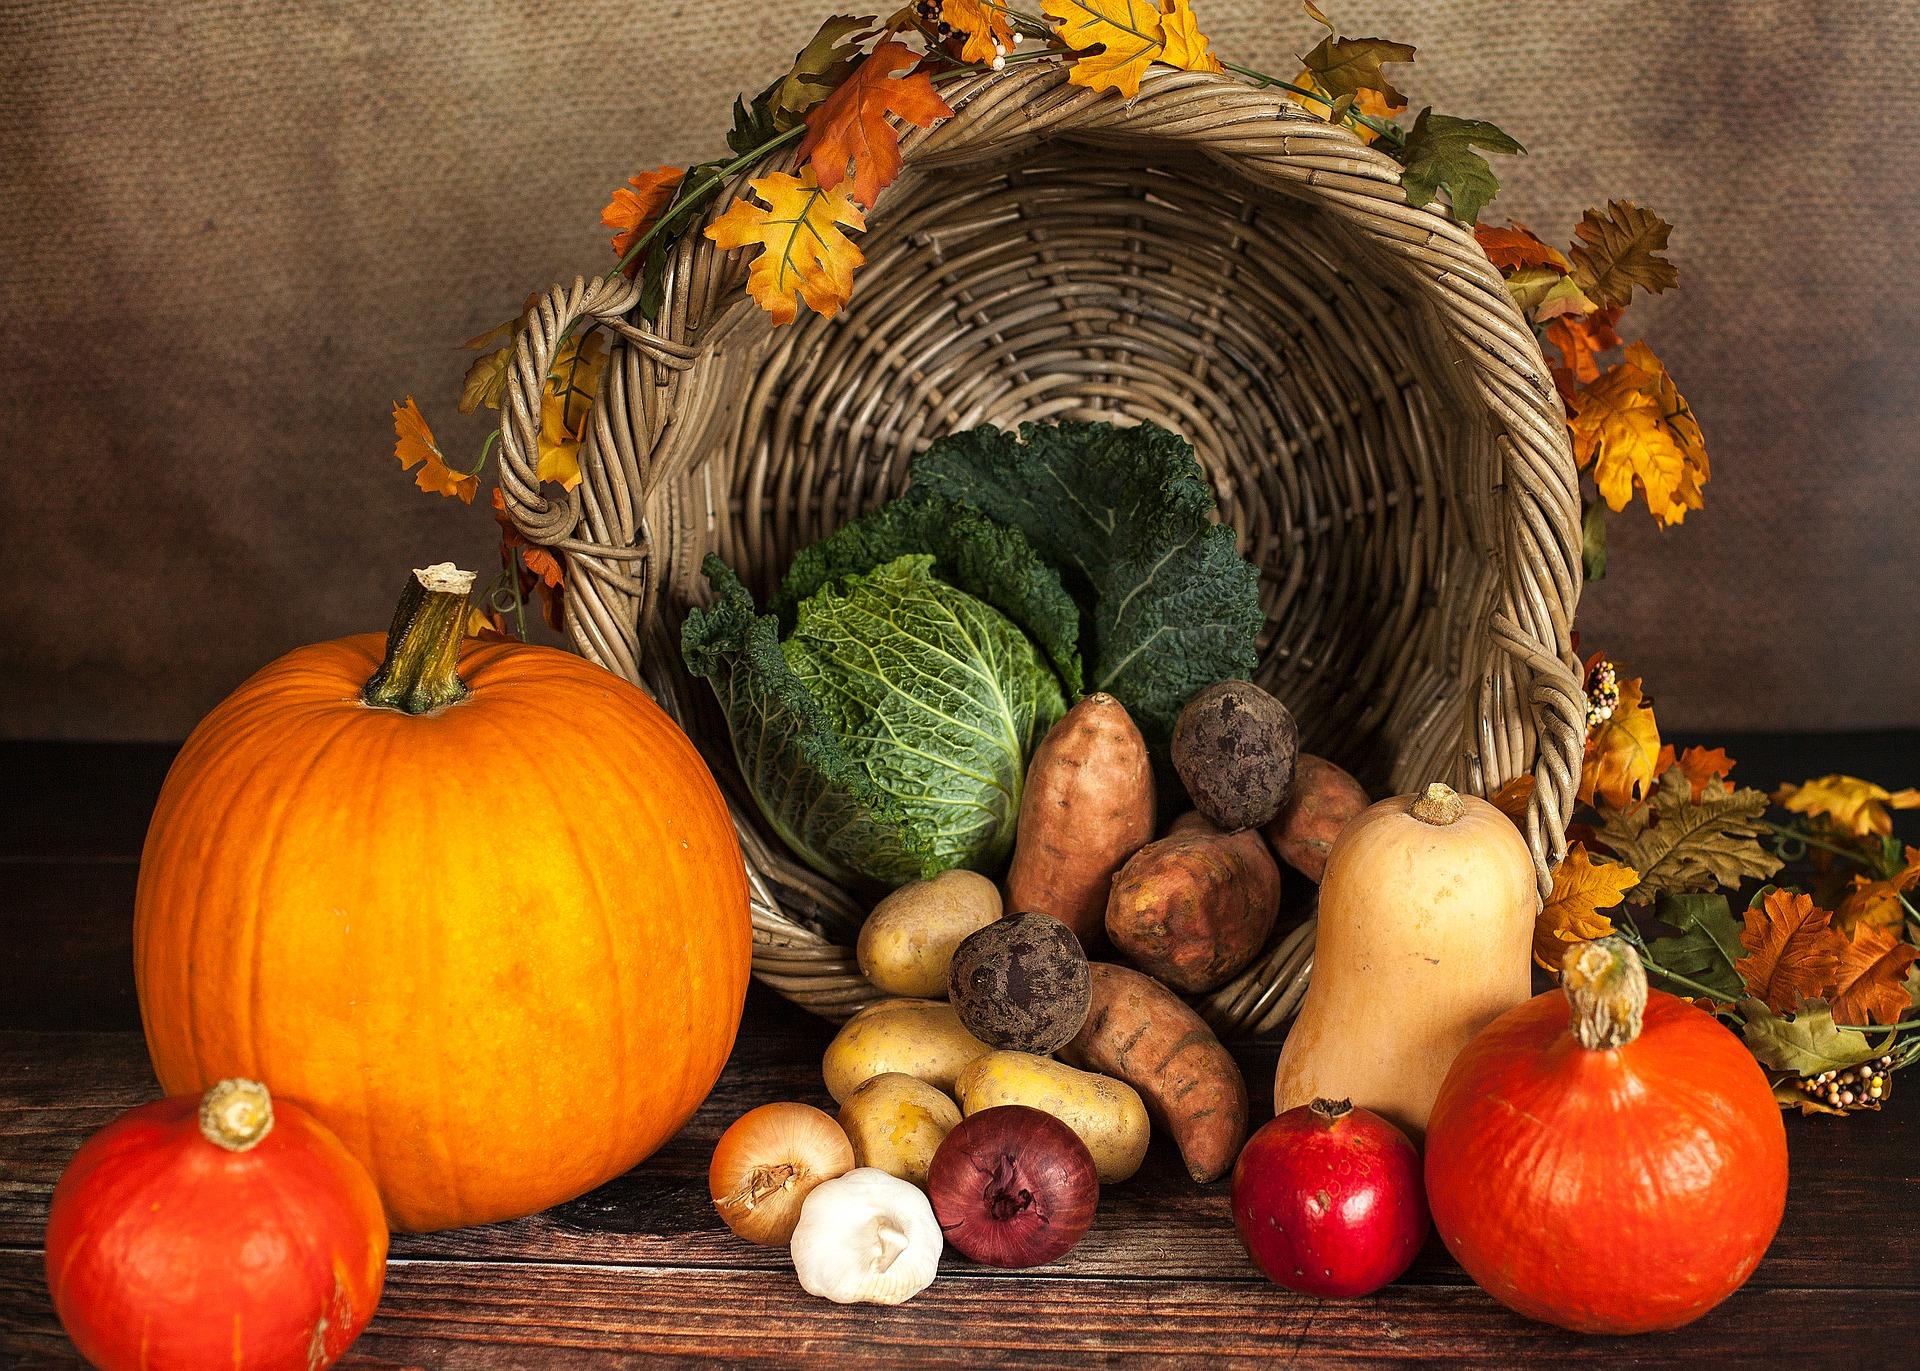 Photo of Harvest Vegetables in Tipped Basket